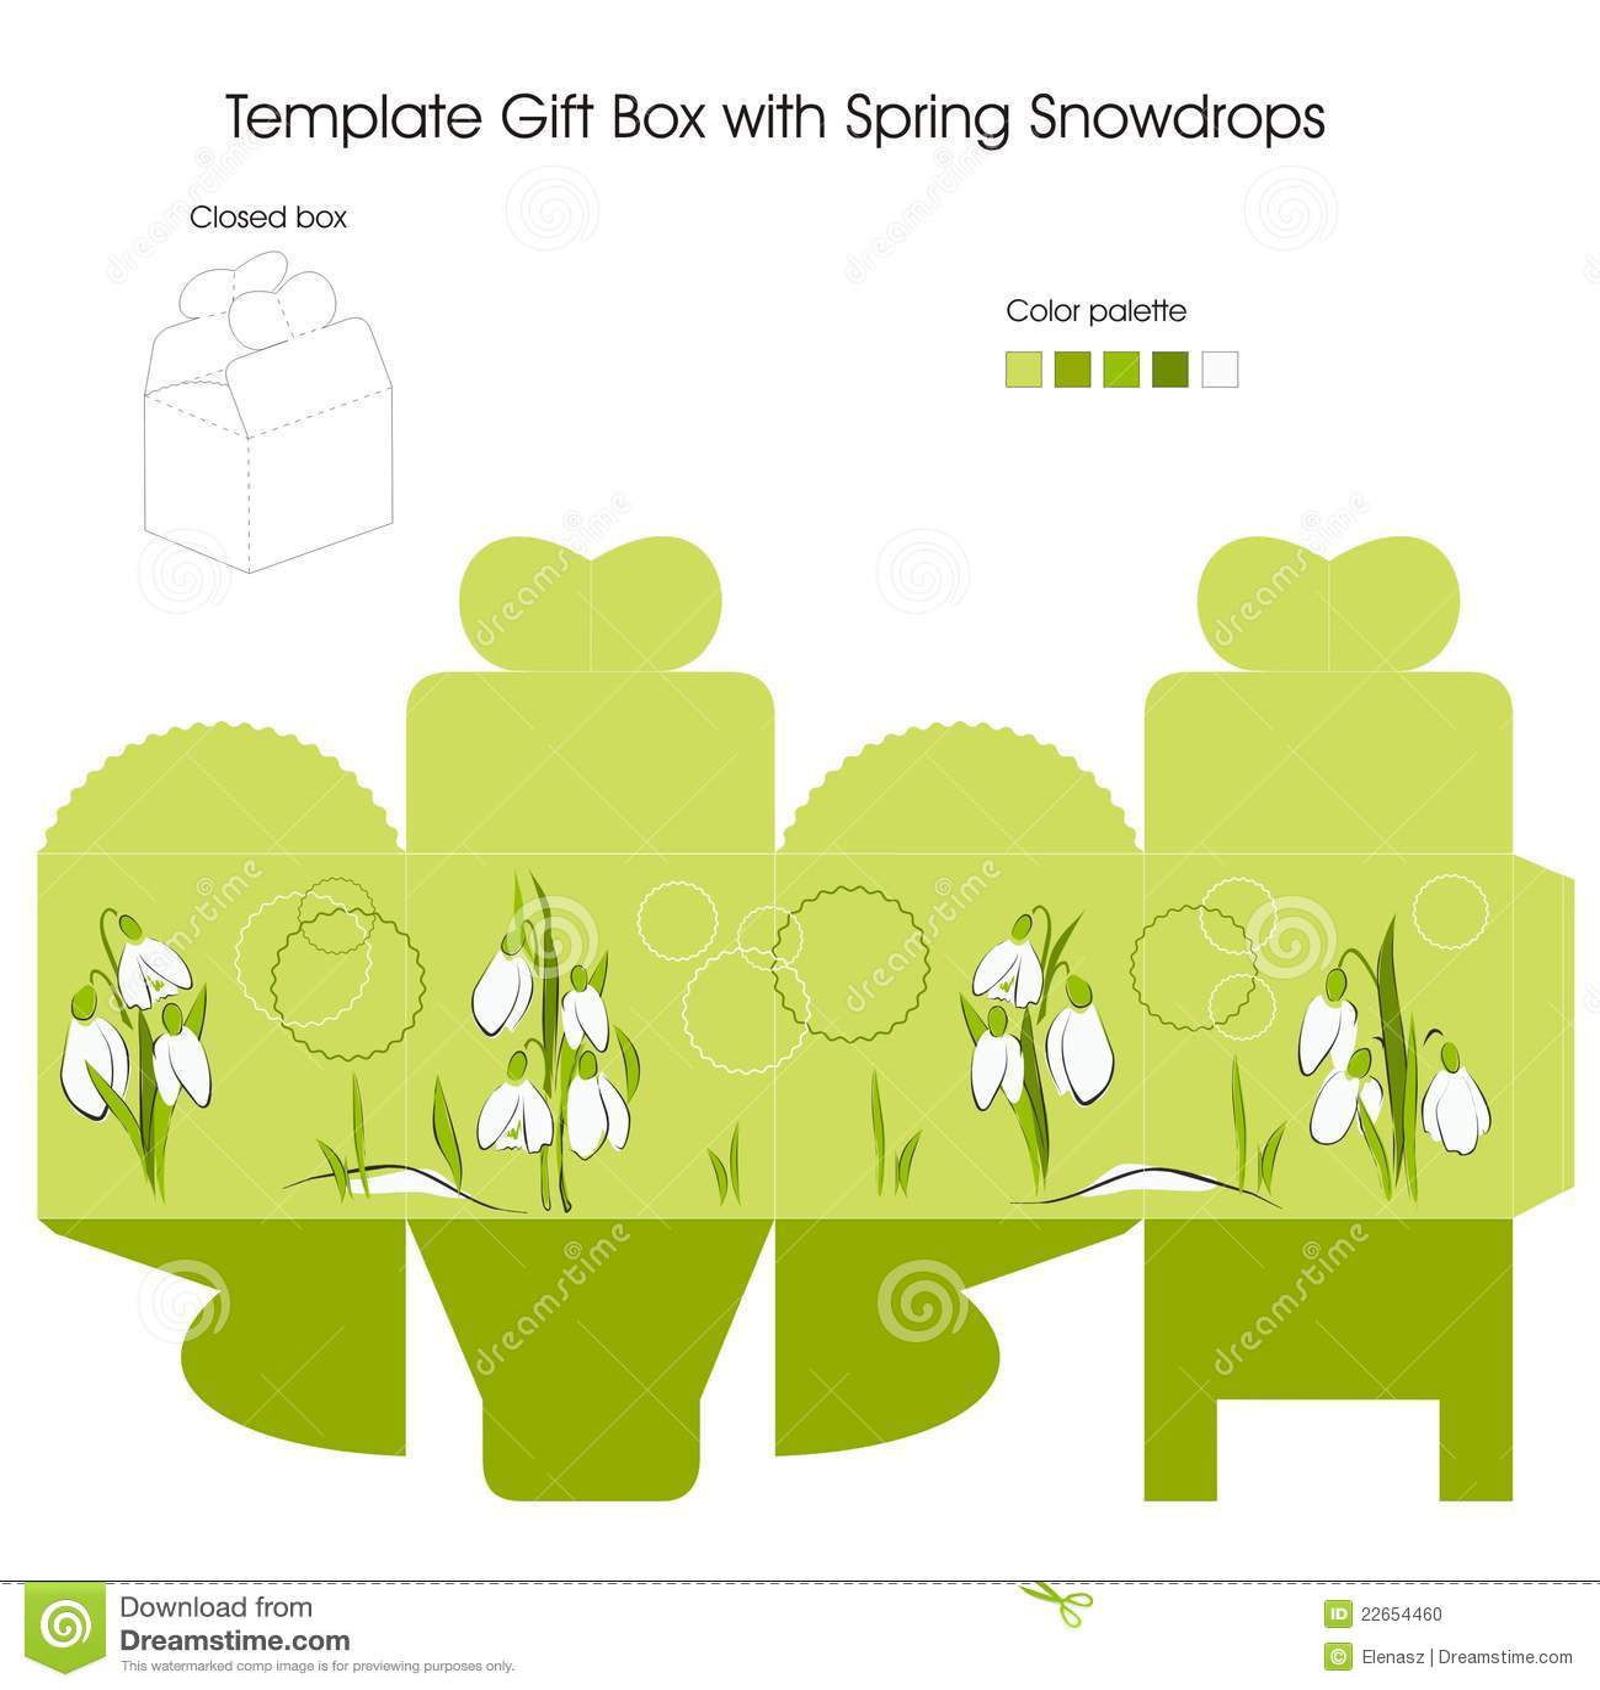 Gift Box for Wedding Favors